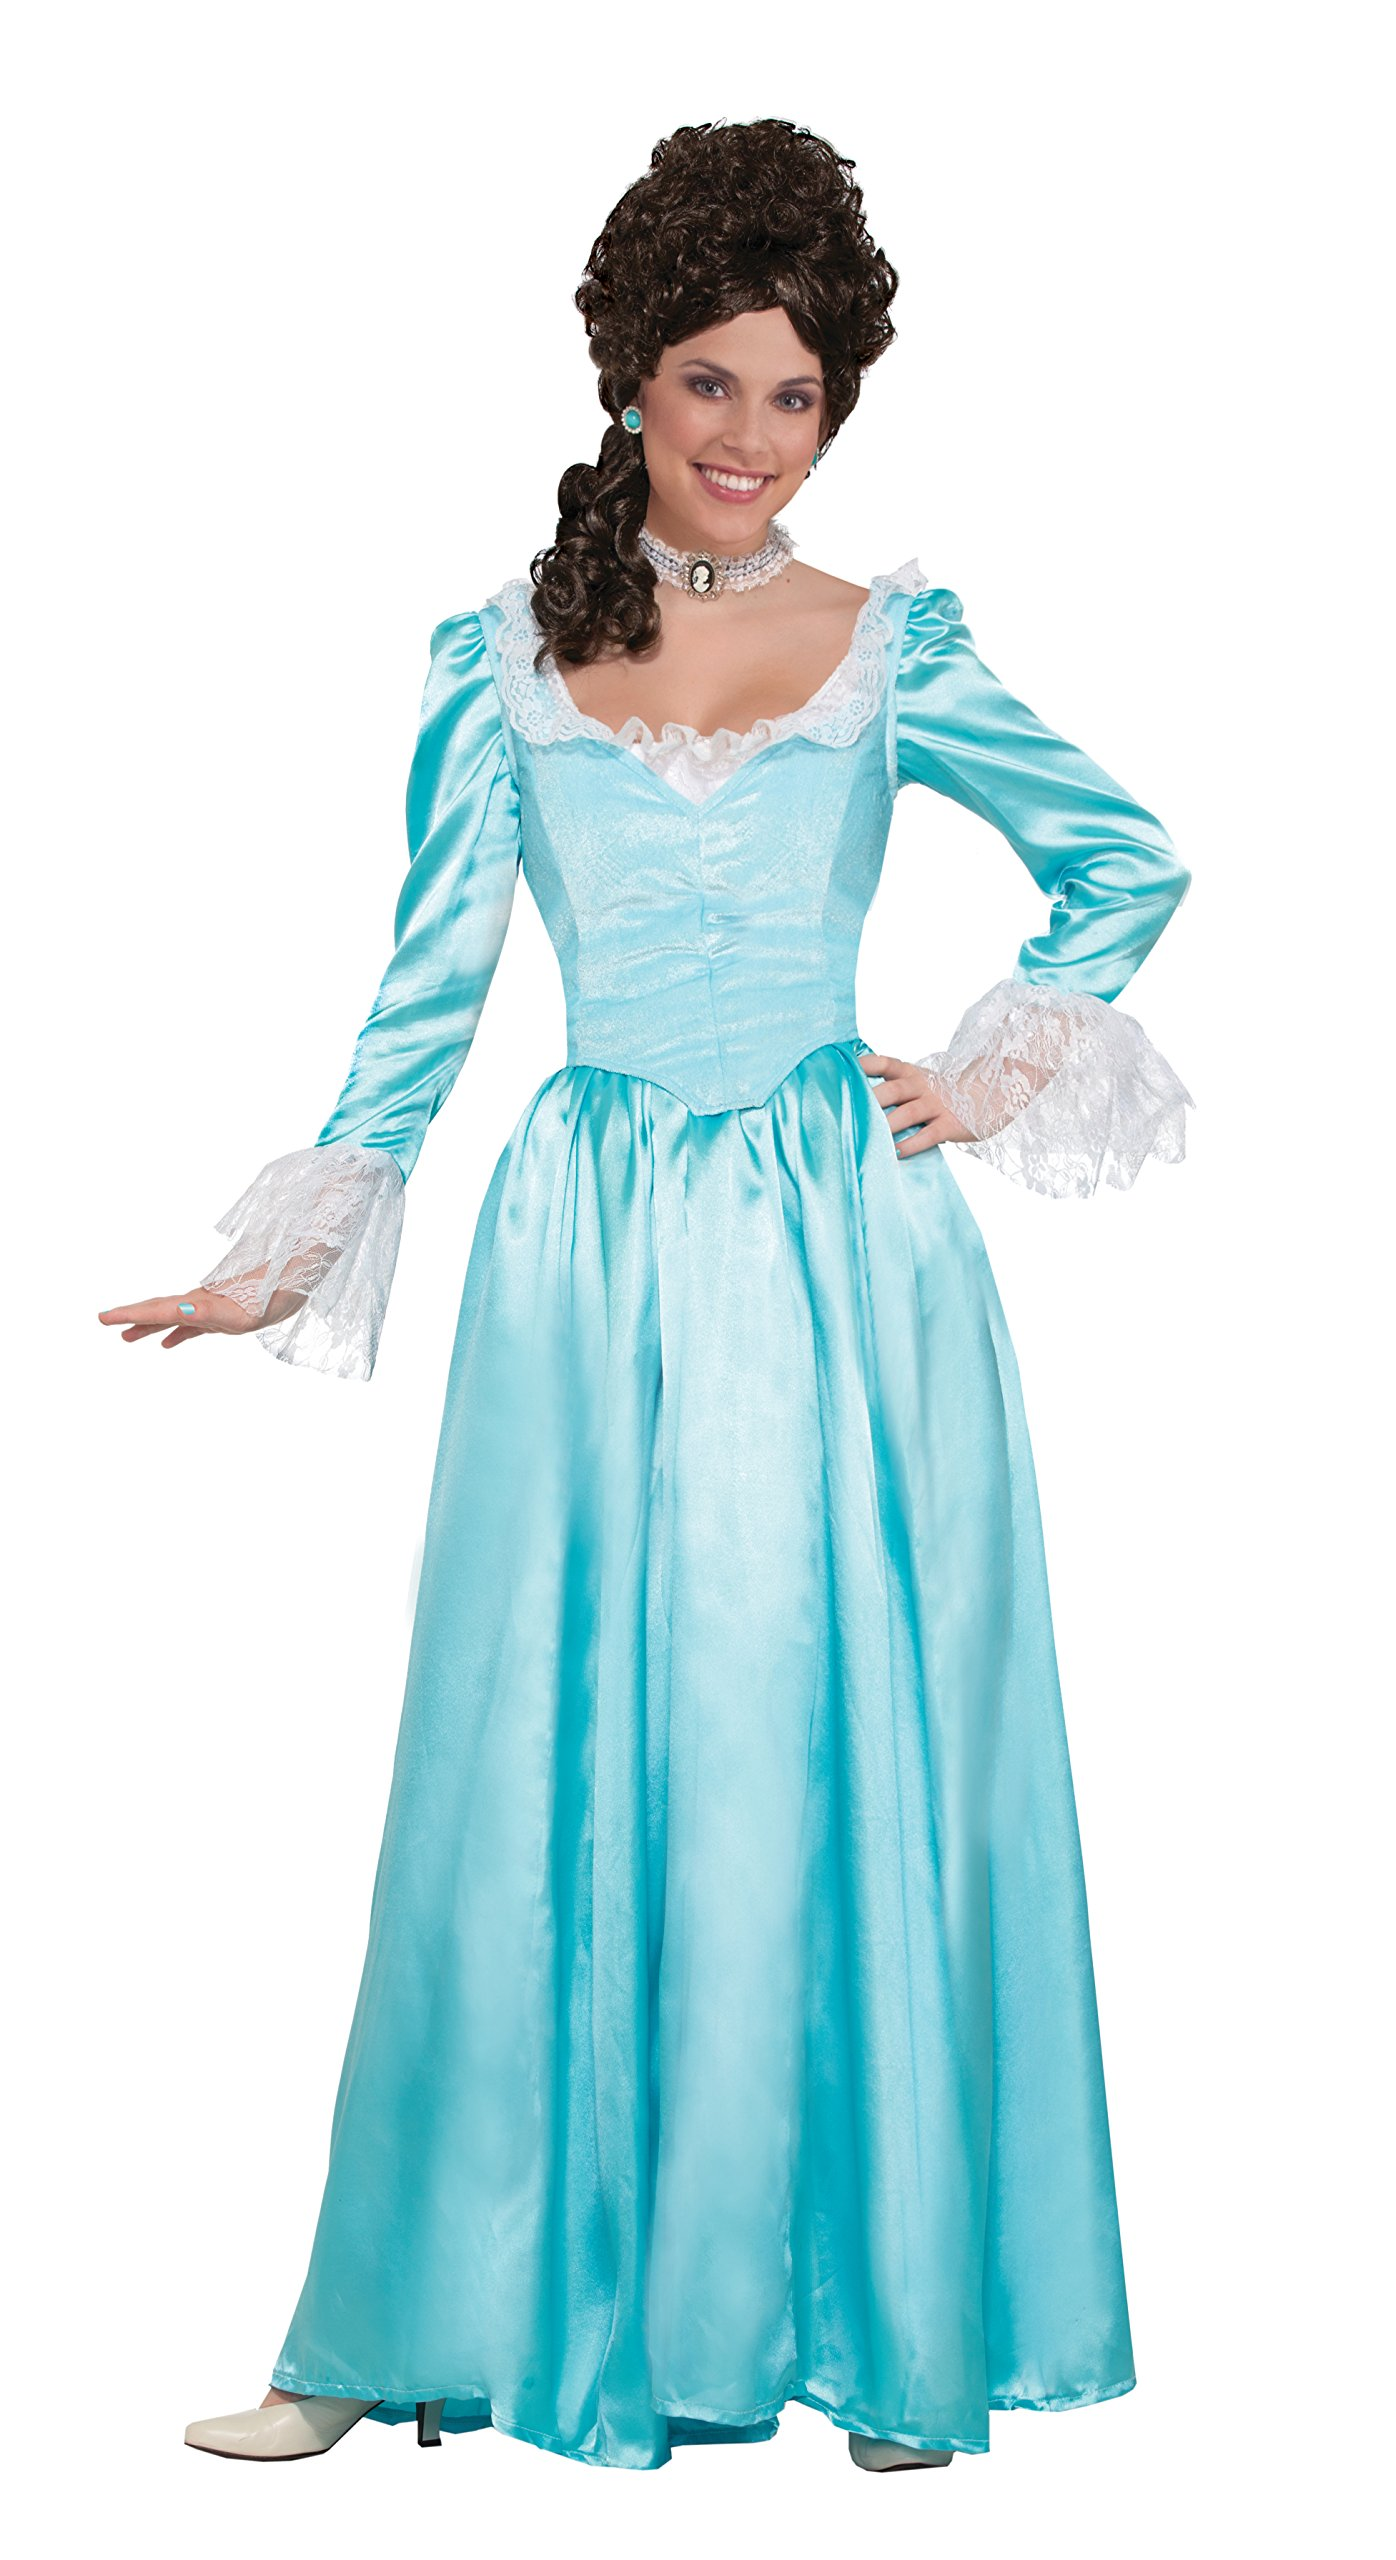 Forum Women's Colonial Lady Corset-Style Dress, Blue, M